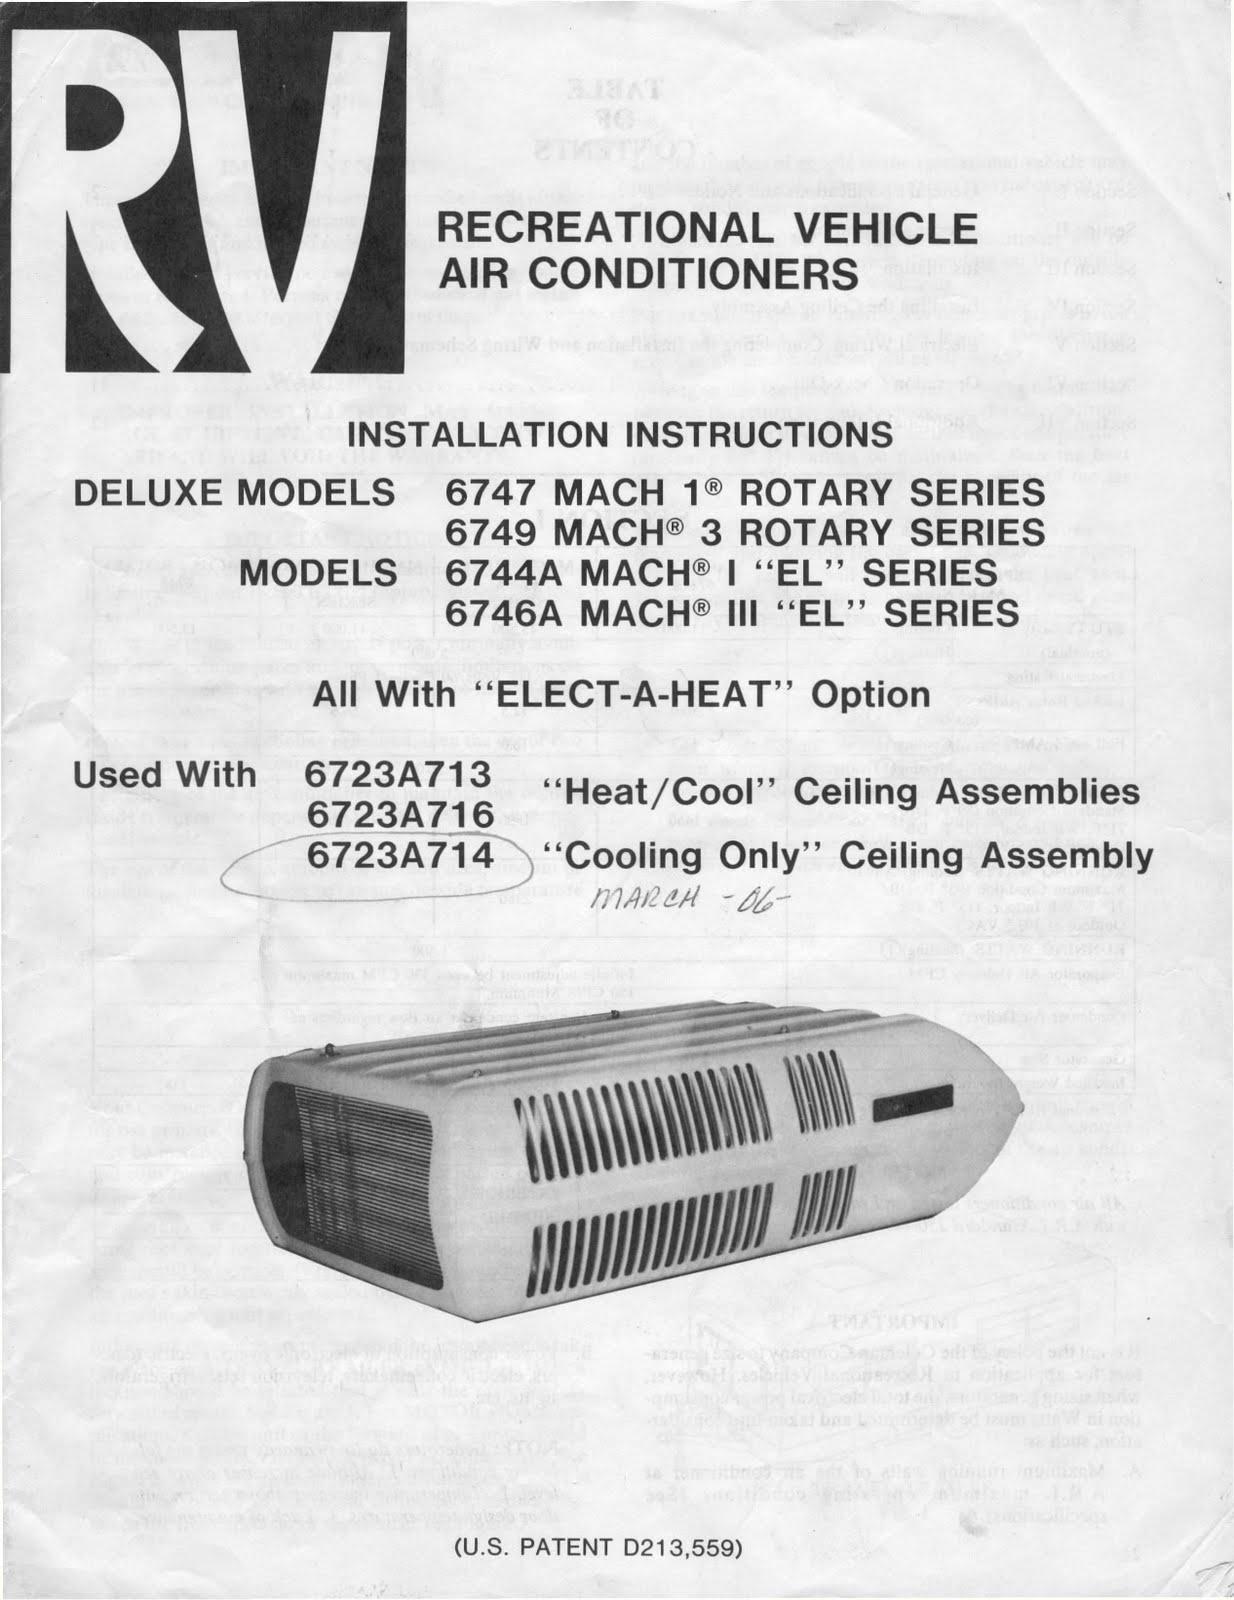 coleman mach air conditioner wiring diagram honeywell thermostat rth6350 rv conditioning